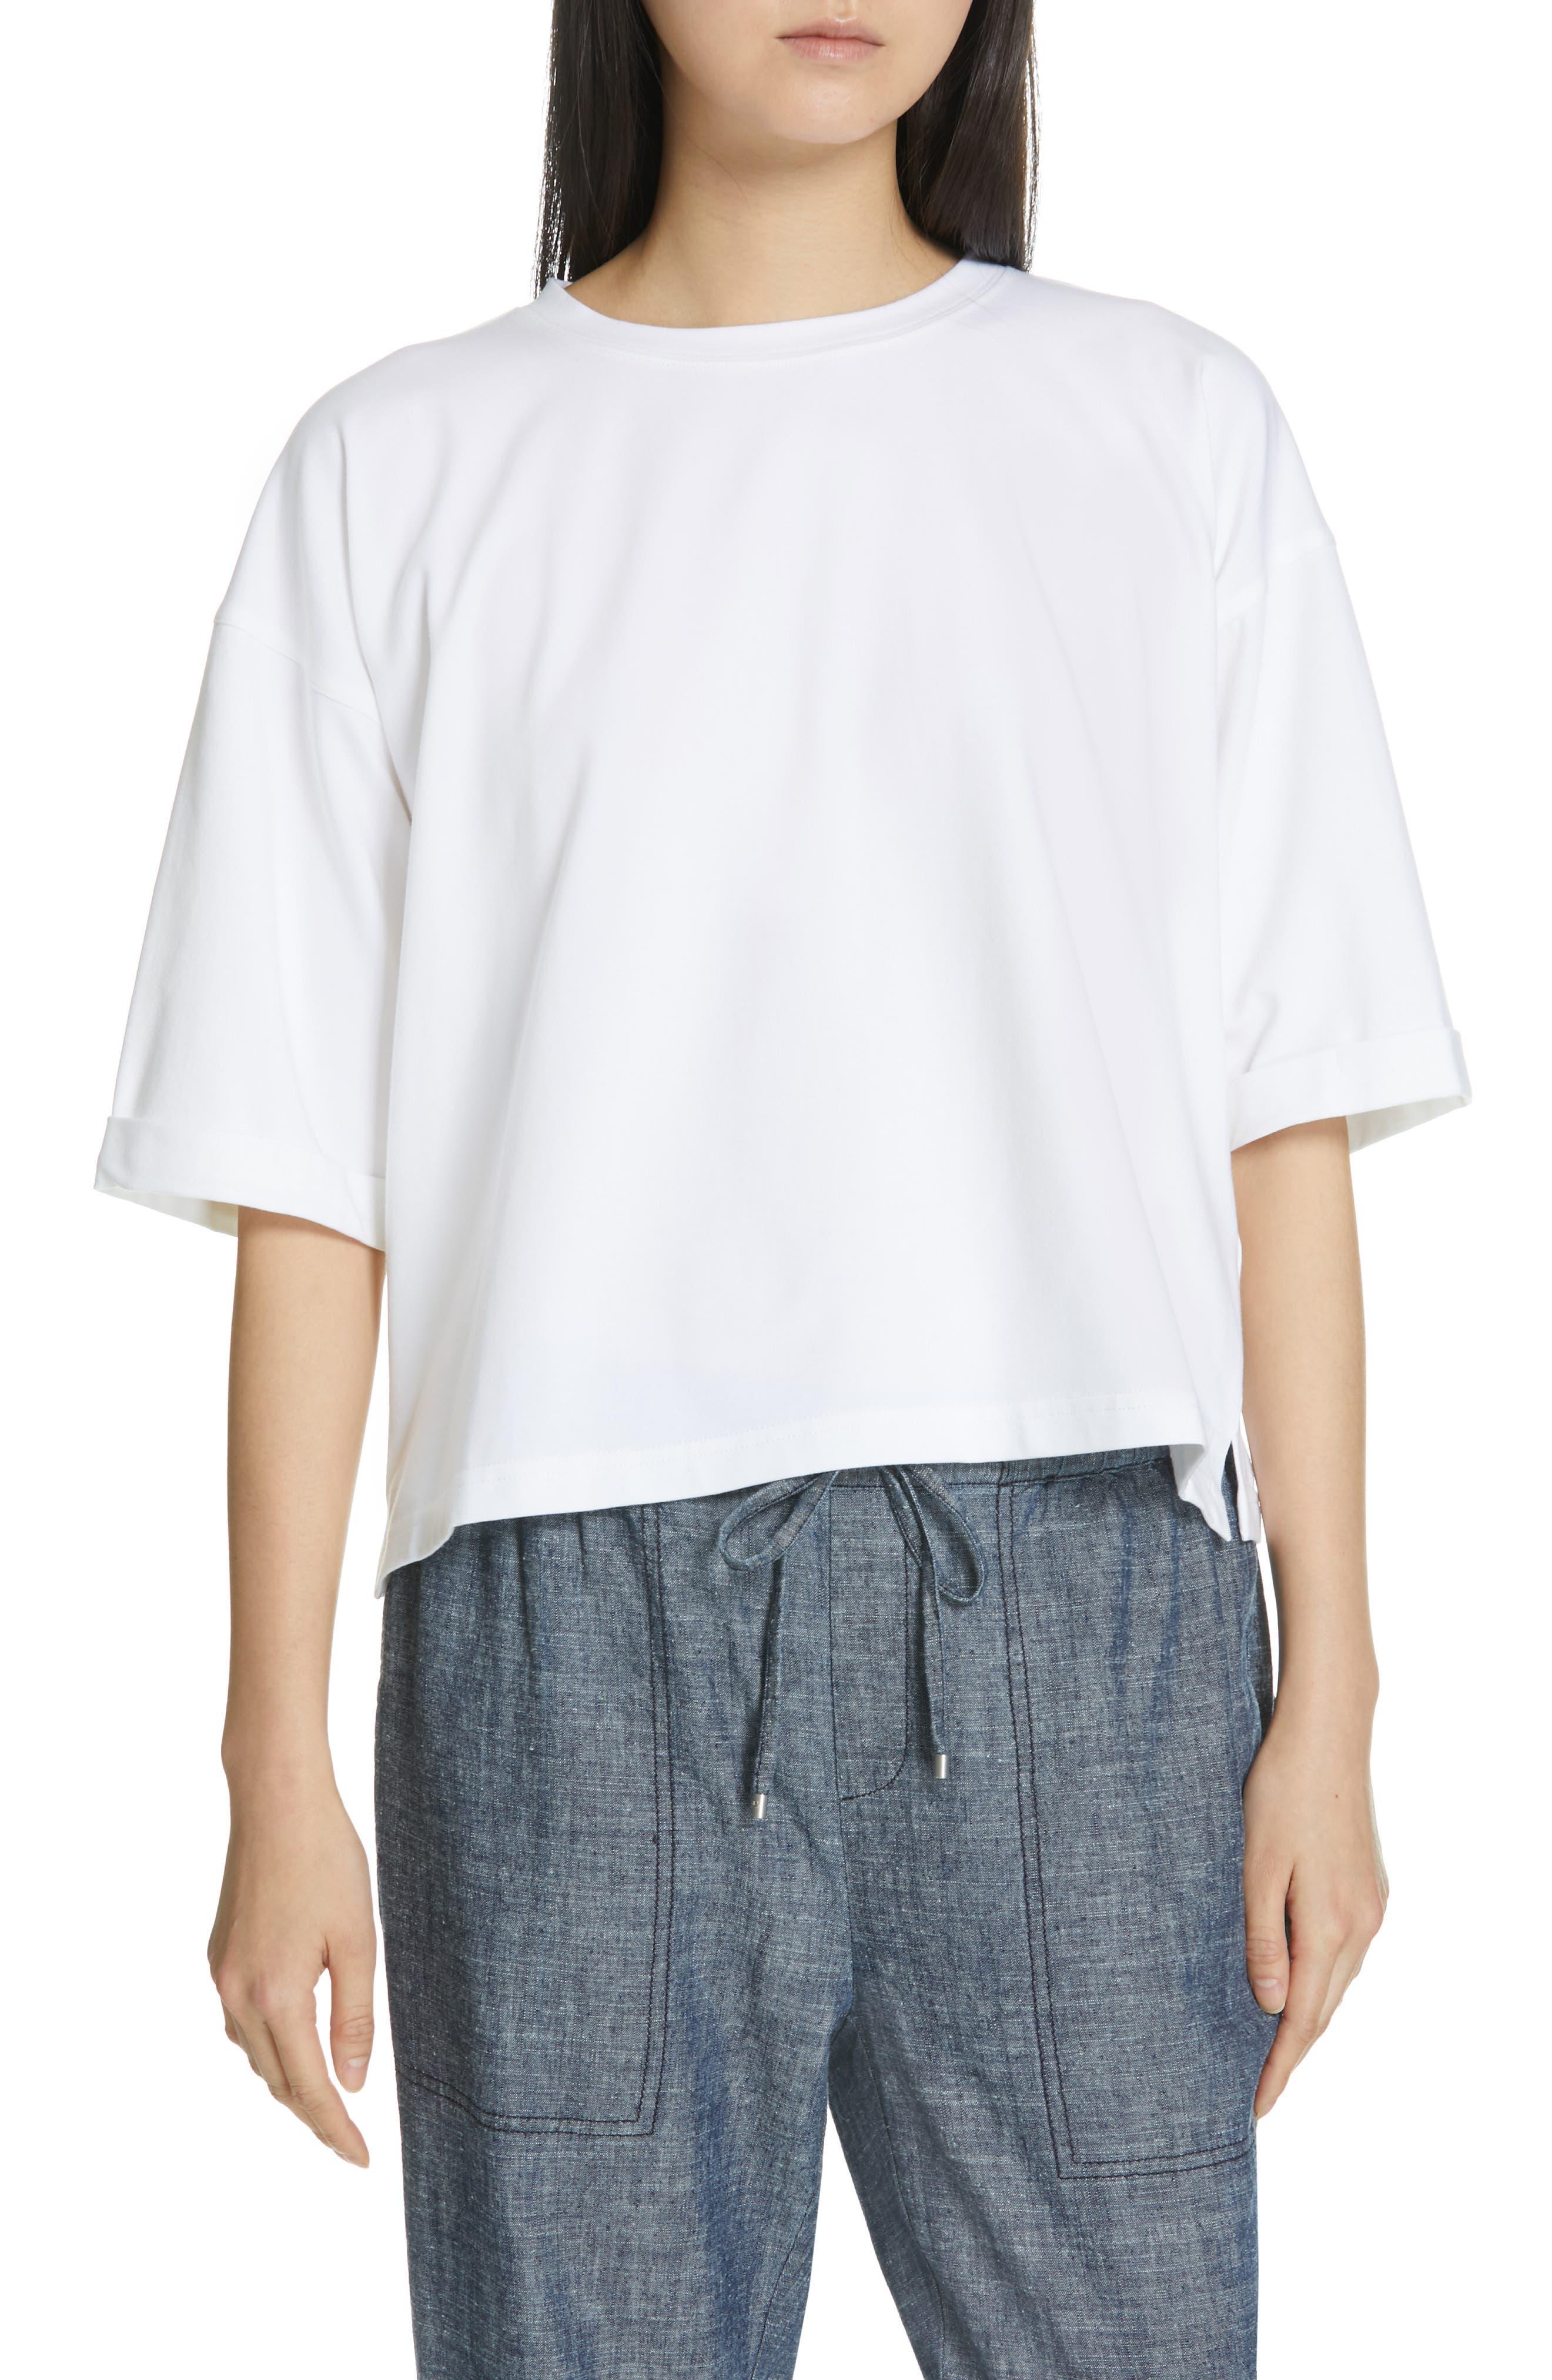 Eileen Fisher Stretch Organic Cotton Top, White